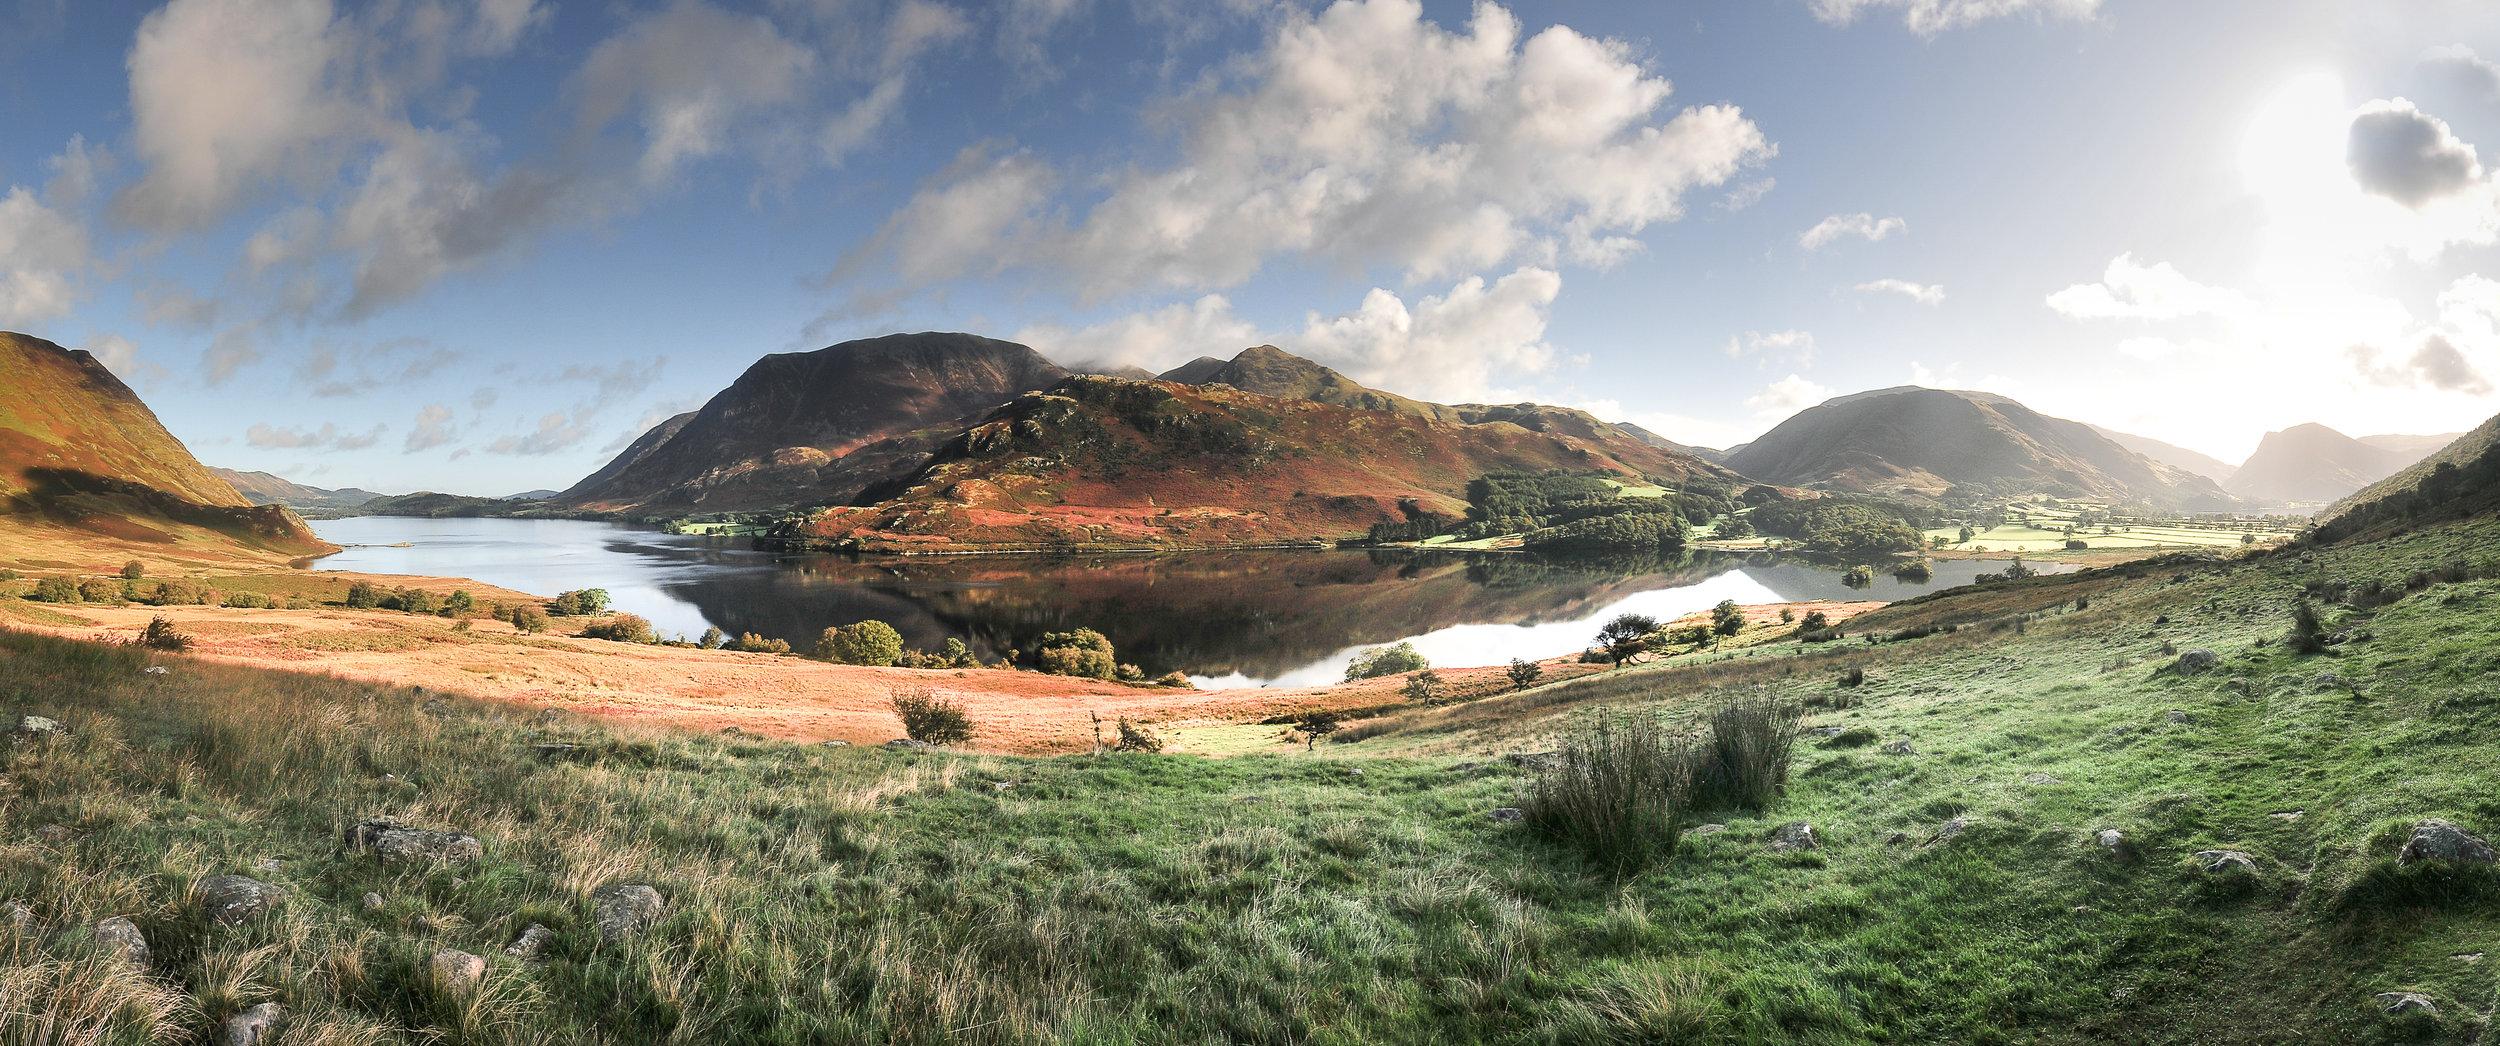 Lake District pano.jpg